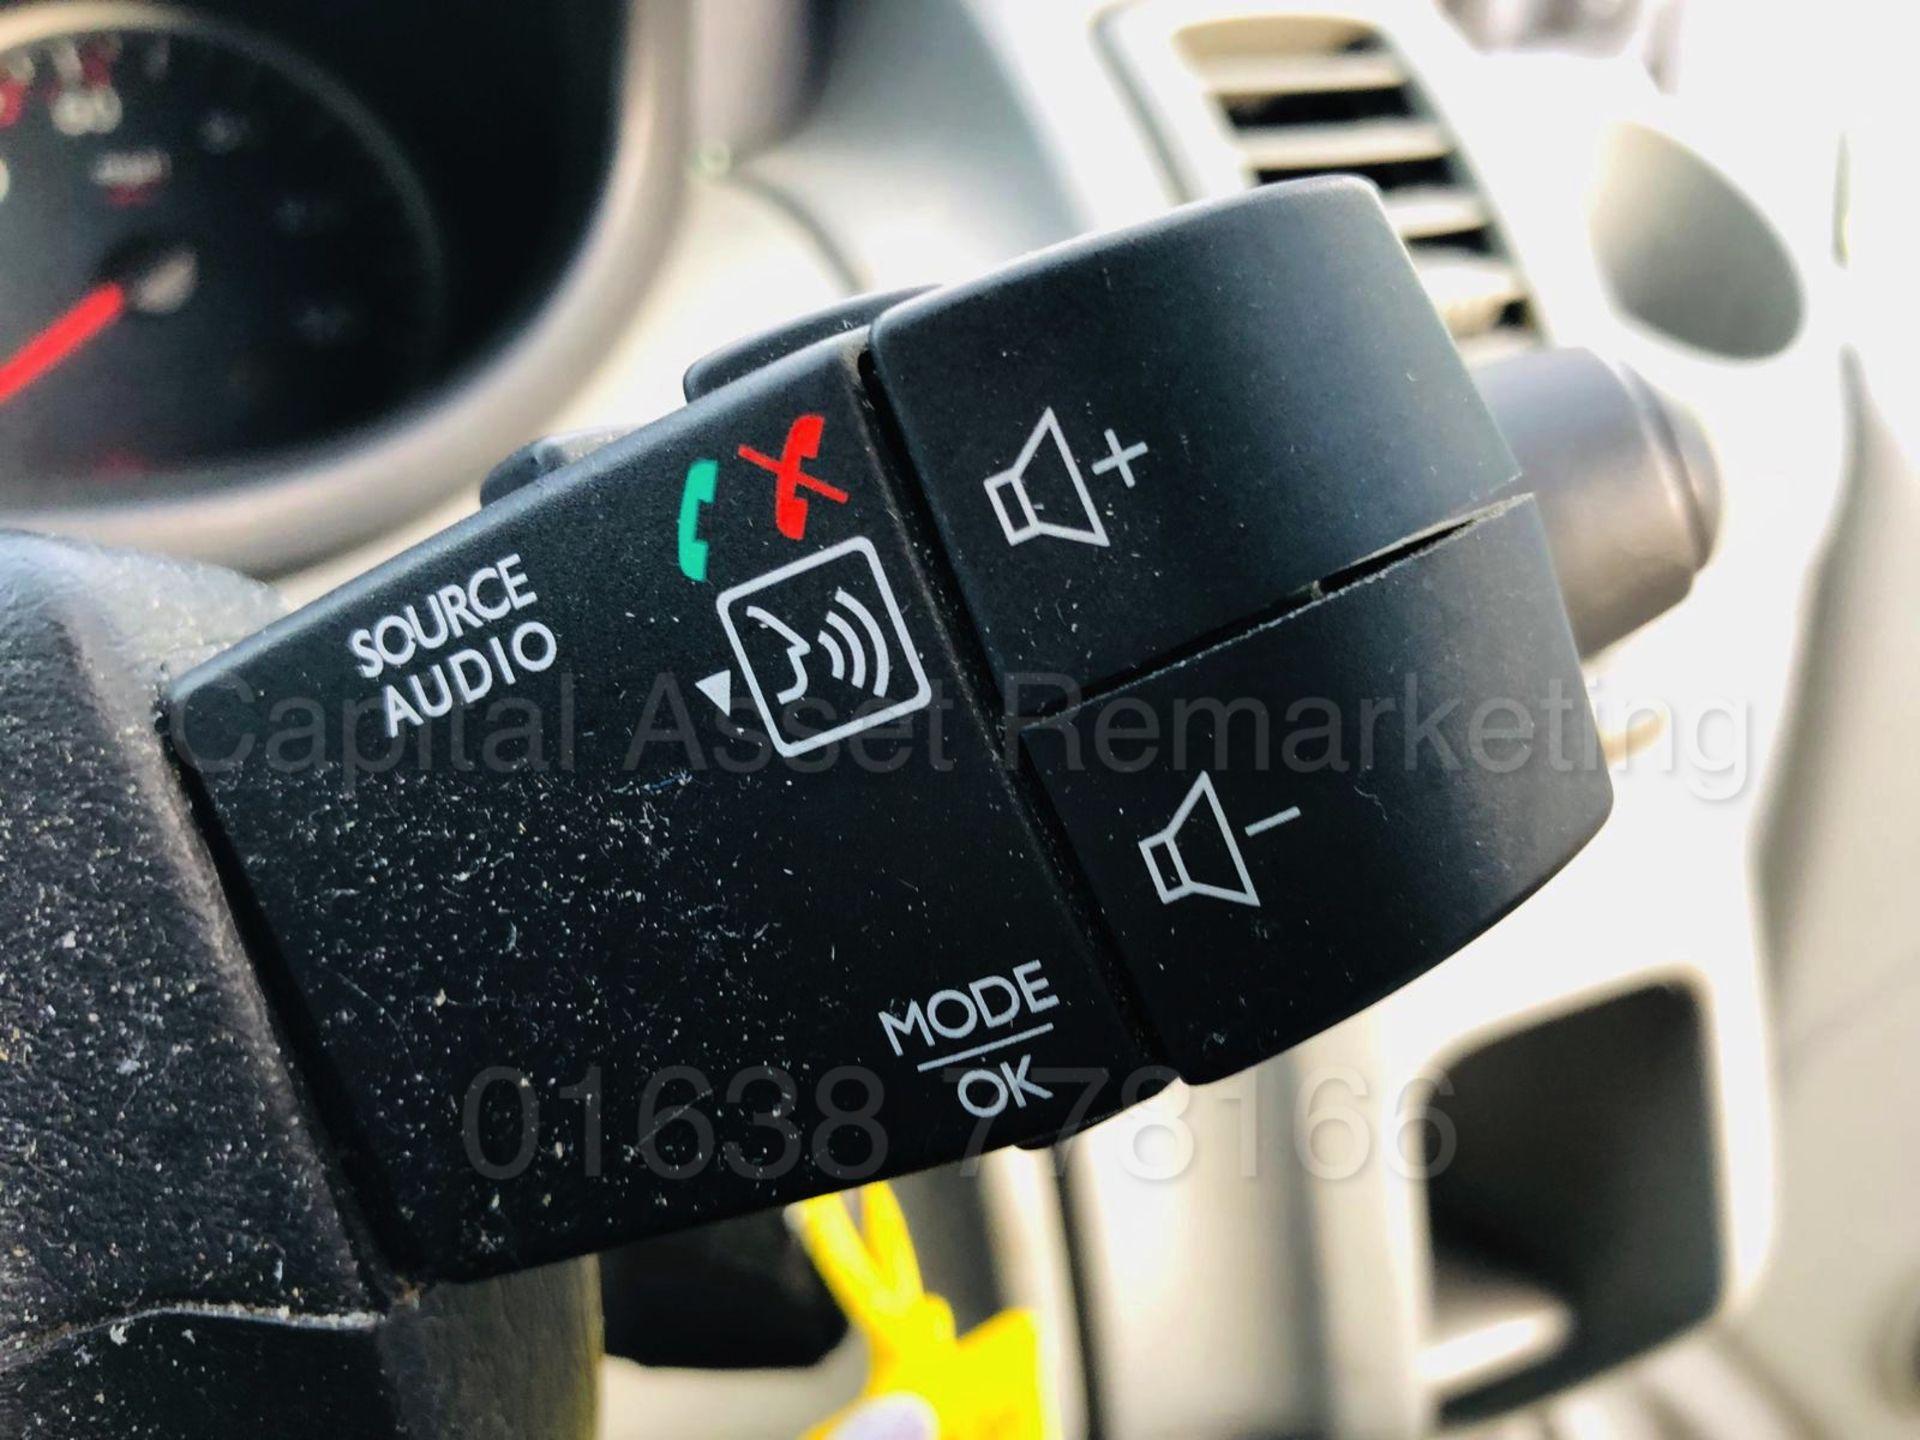 Lot 23 - RENAULT TRAFIC SL27 *SPORT* (2013 MODEL) '2.0 DCI - 115 BHP - 6 SPEED' *AIR CON - SAT NAV* (NO VAT)